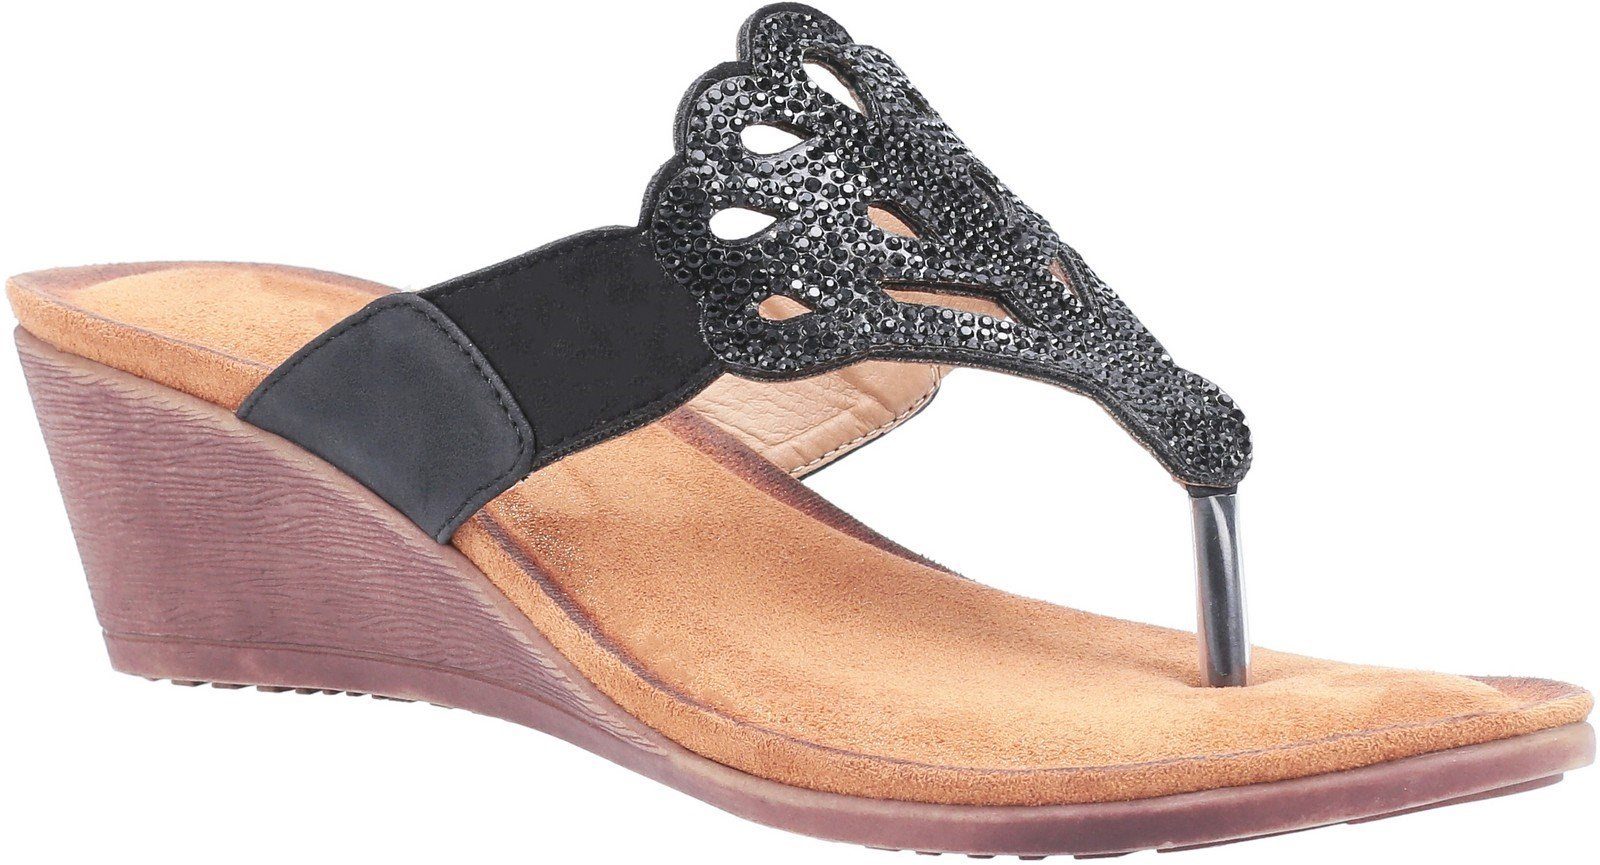 Divaz Women's Felicity Toe Post Sandal Various Colours 30123 - Black 3